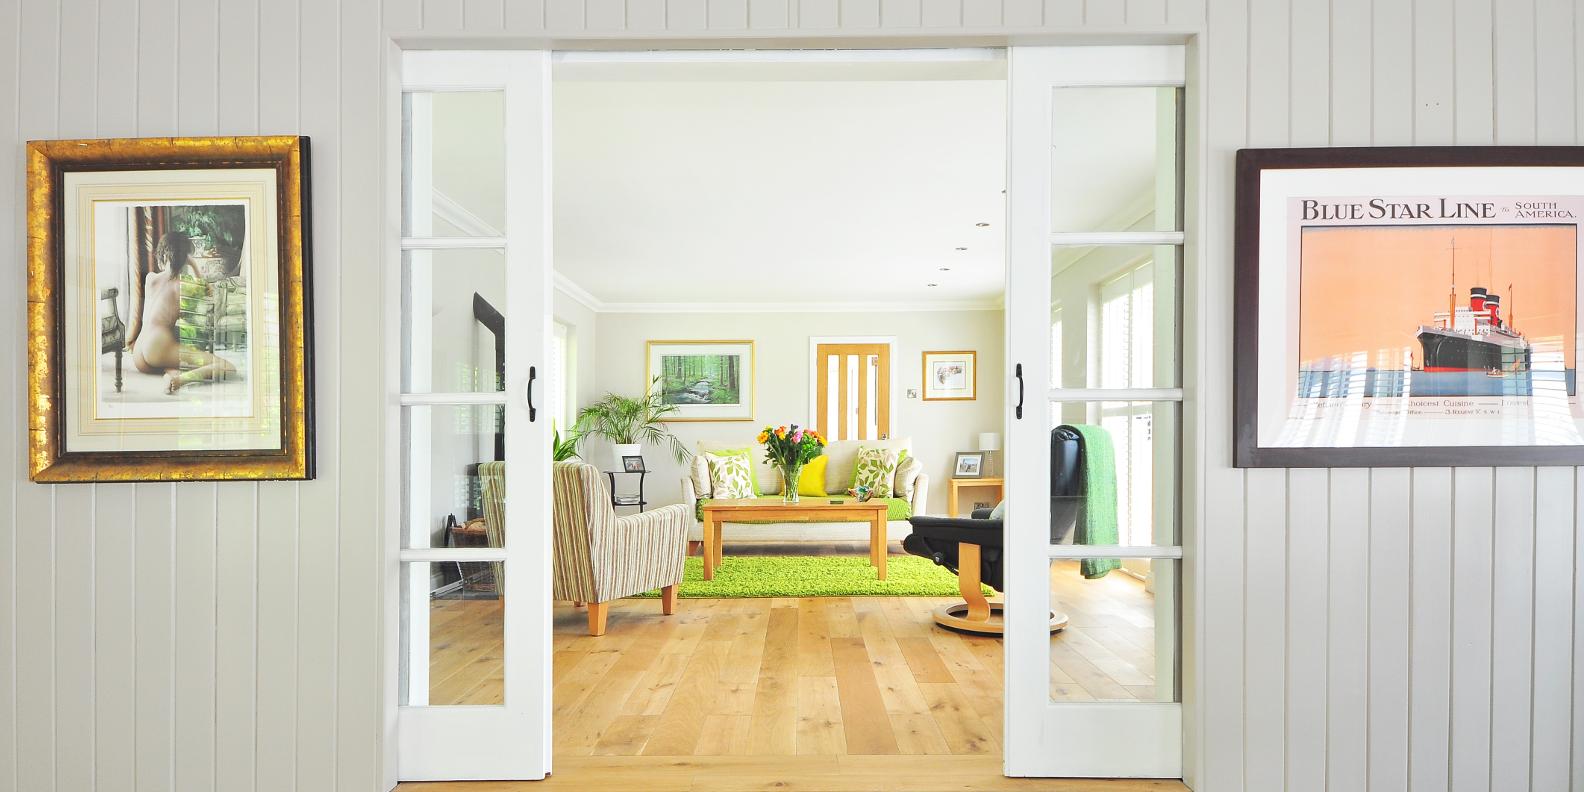 Affittare casa senza sorprese, le 5 regole doro - Casa.it